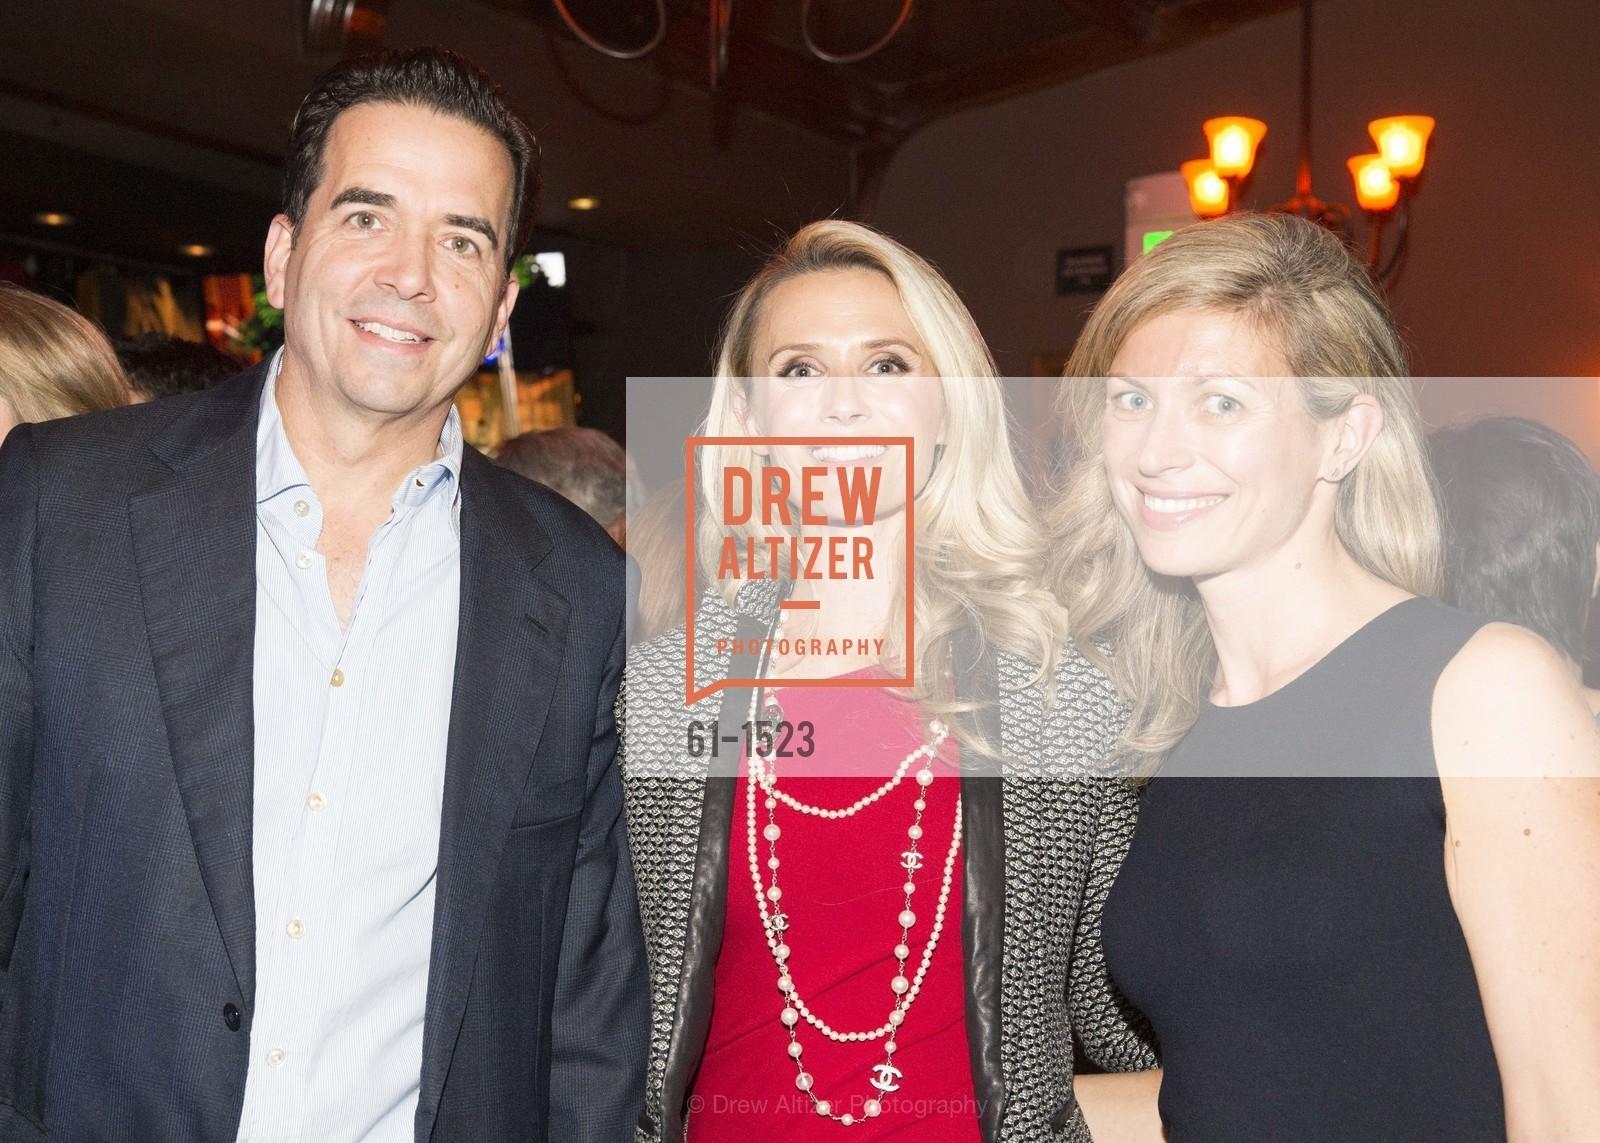 Jennifer Siebel Newsom, Ted Janul, Kathleen Janul, Photo #61-1523